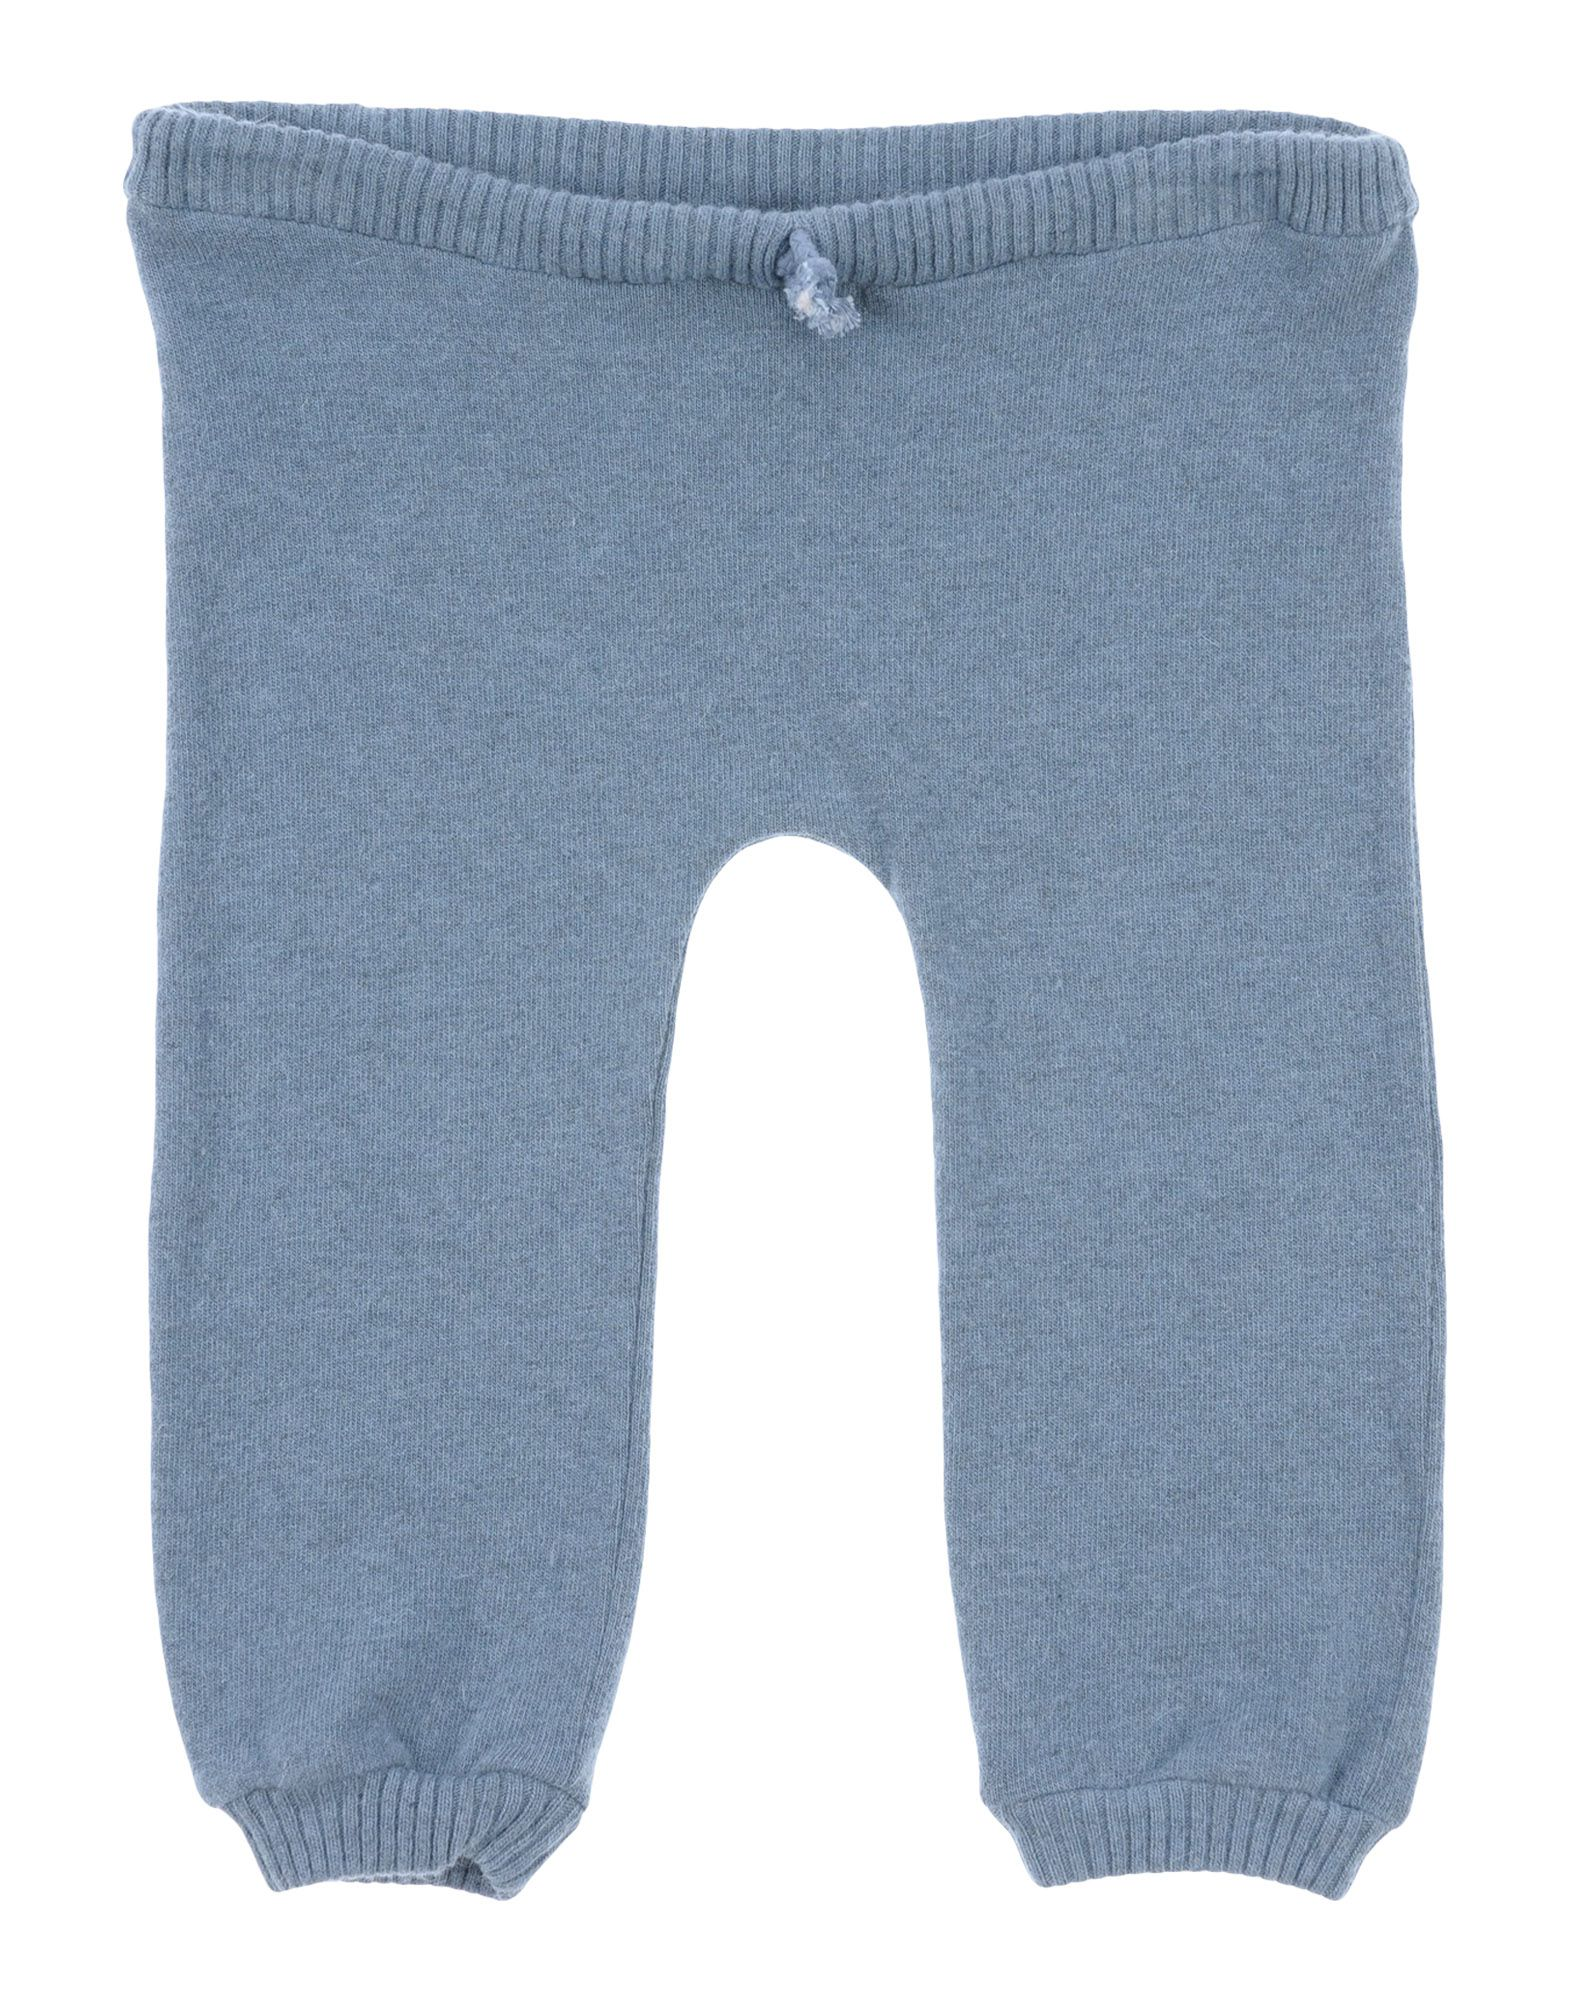 OPILILAI Casual Pants in Slate Blue